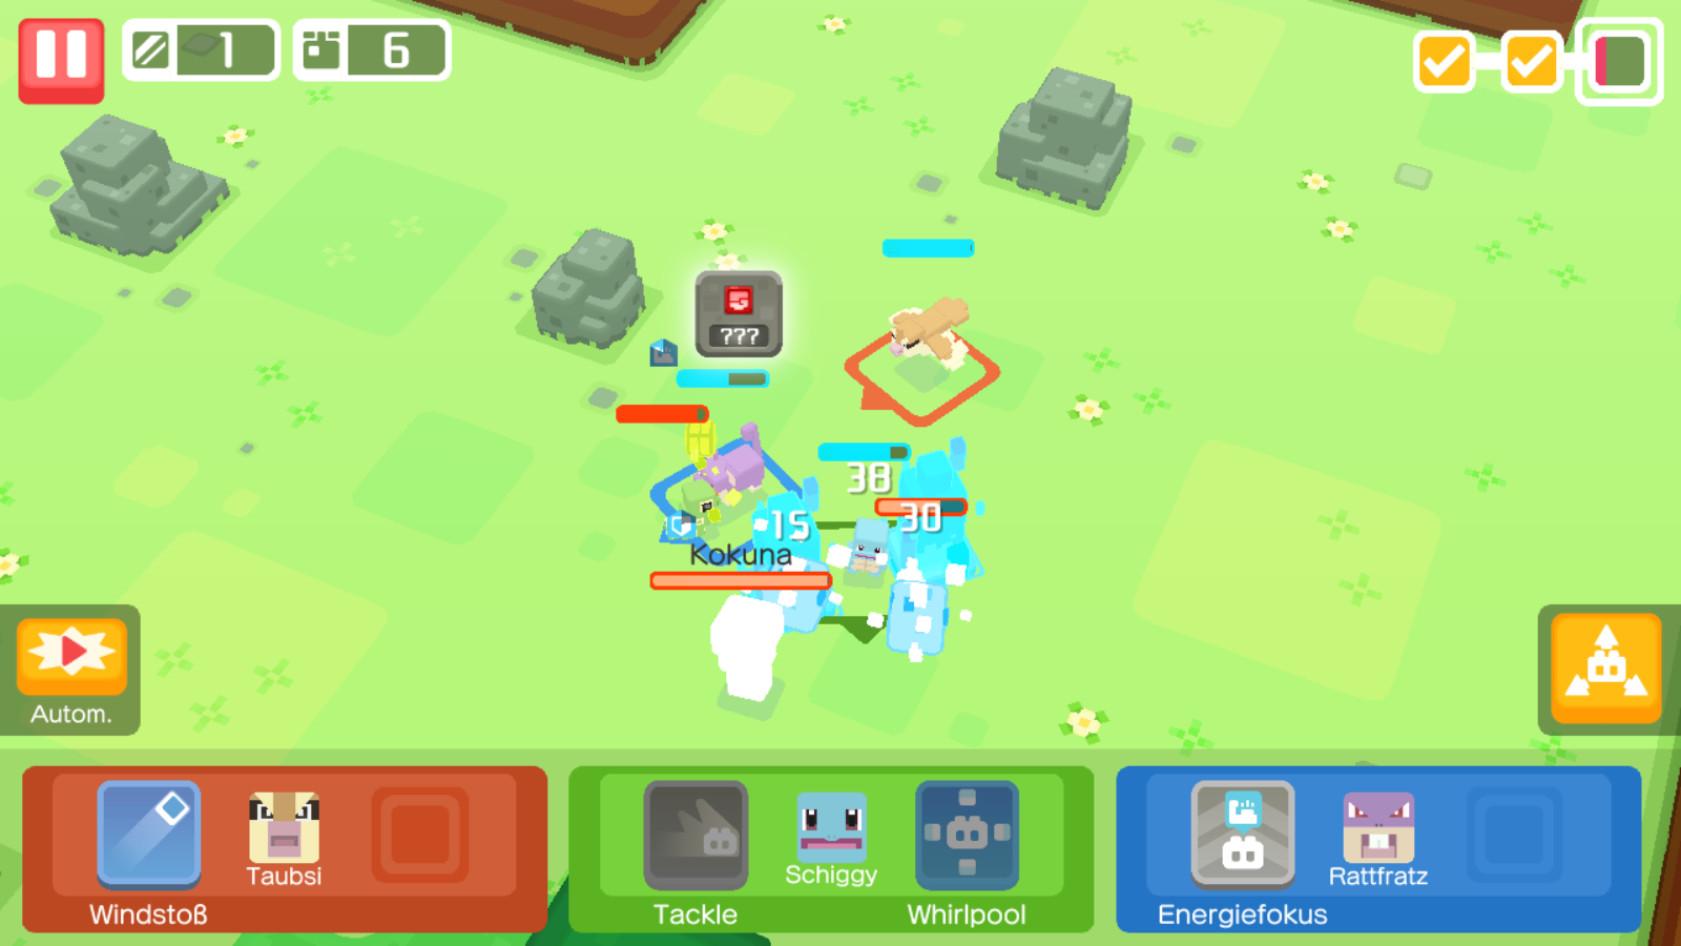 Screenshot 1 - Pokémon Quest (App für iPhone & iPad)